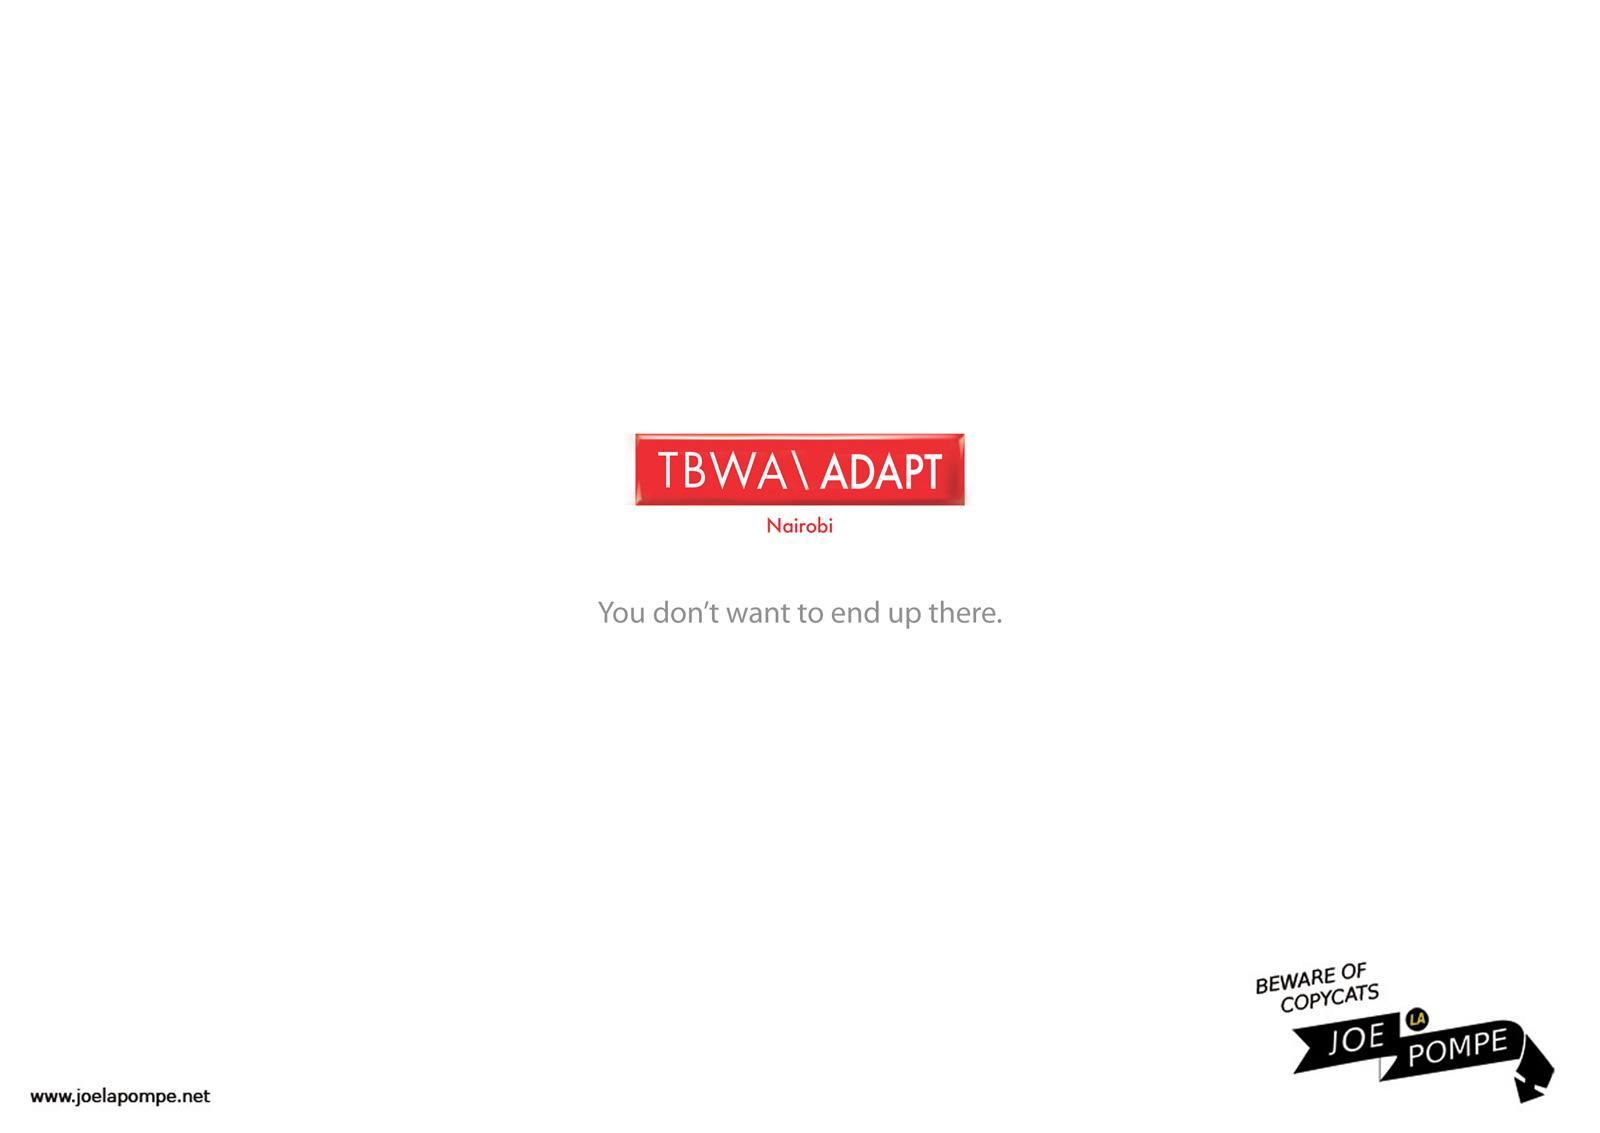 Joelapompe.net Print Ad -  TBWA